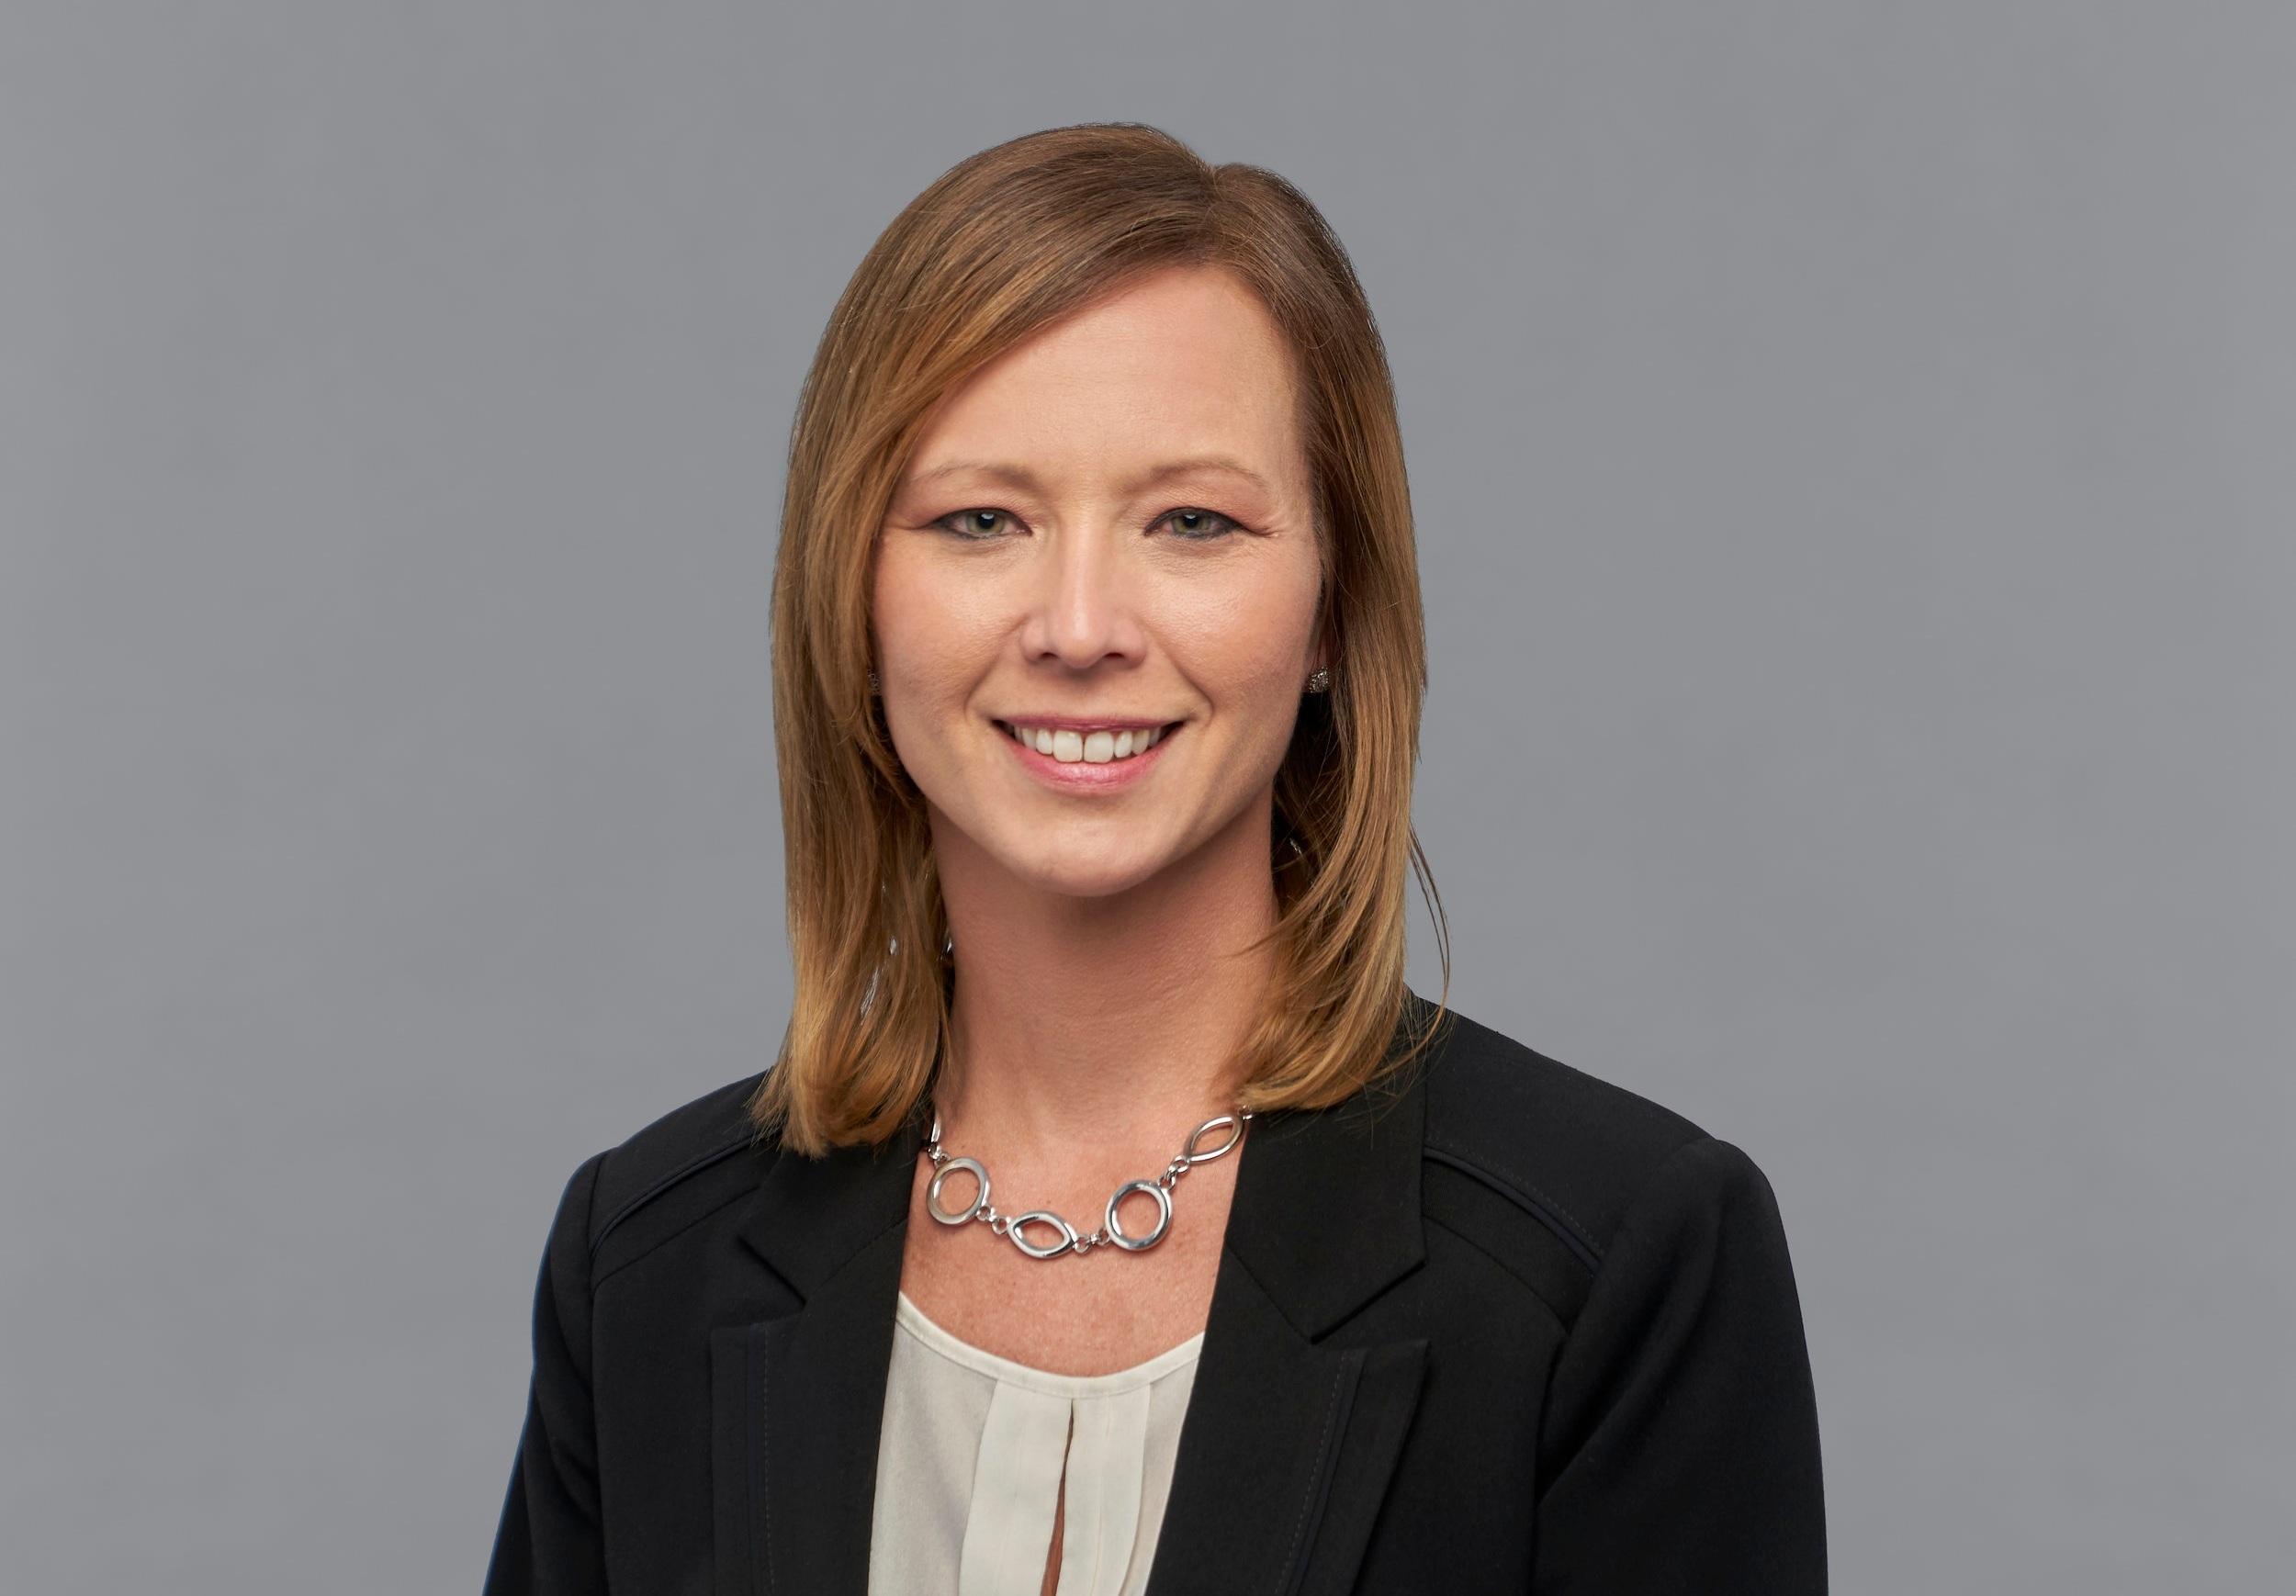 Jennifer Nye, IIDA, LEED AP Principal | Workplace Strategy and Planning